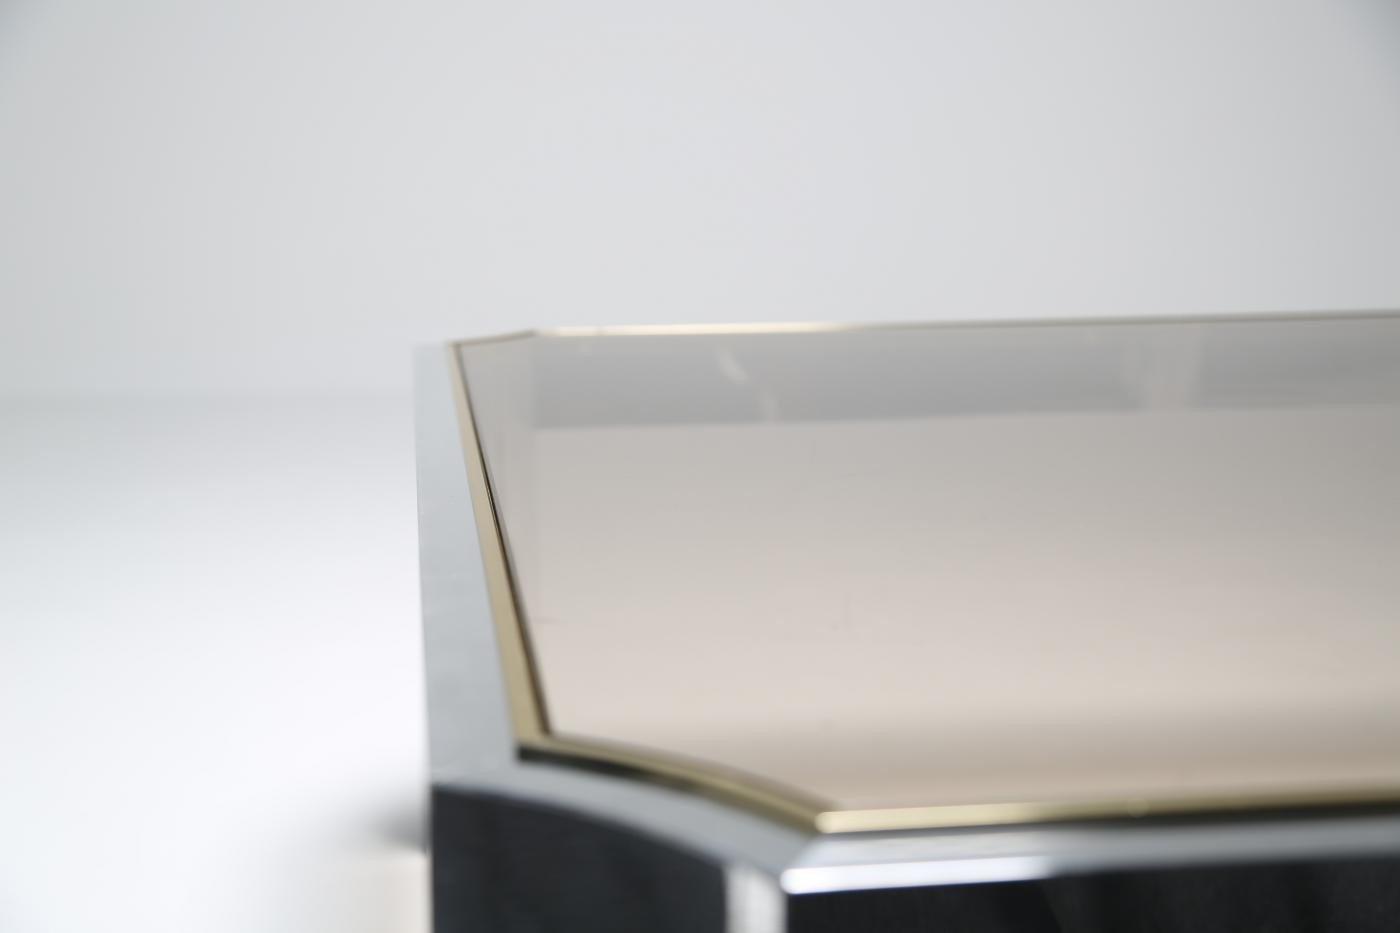 Mid Century Glass Coffee Table With Aluminium Base